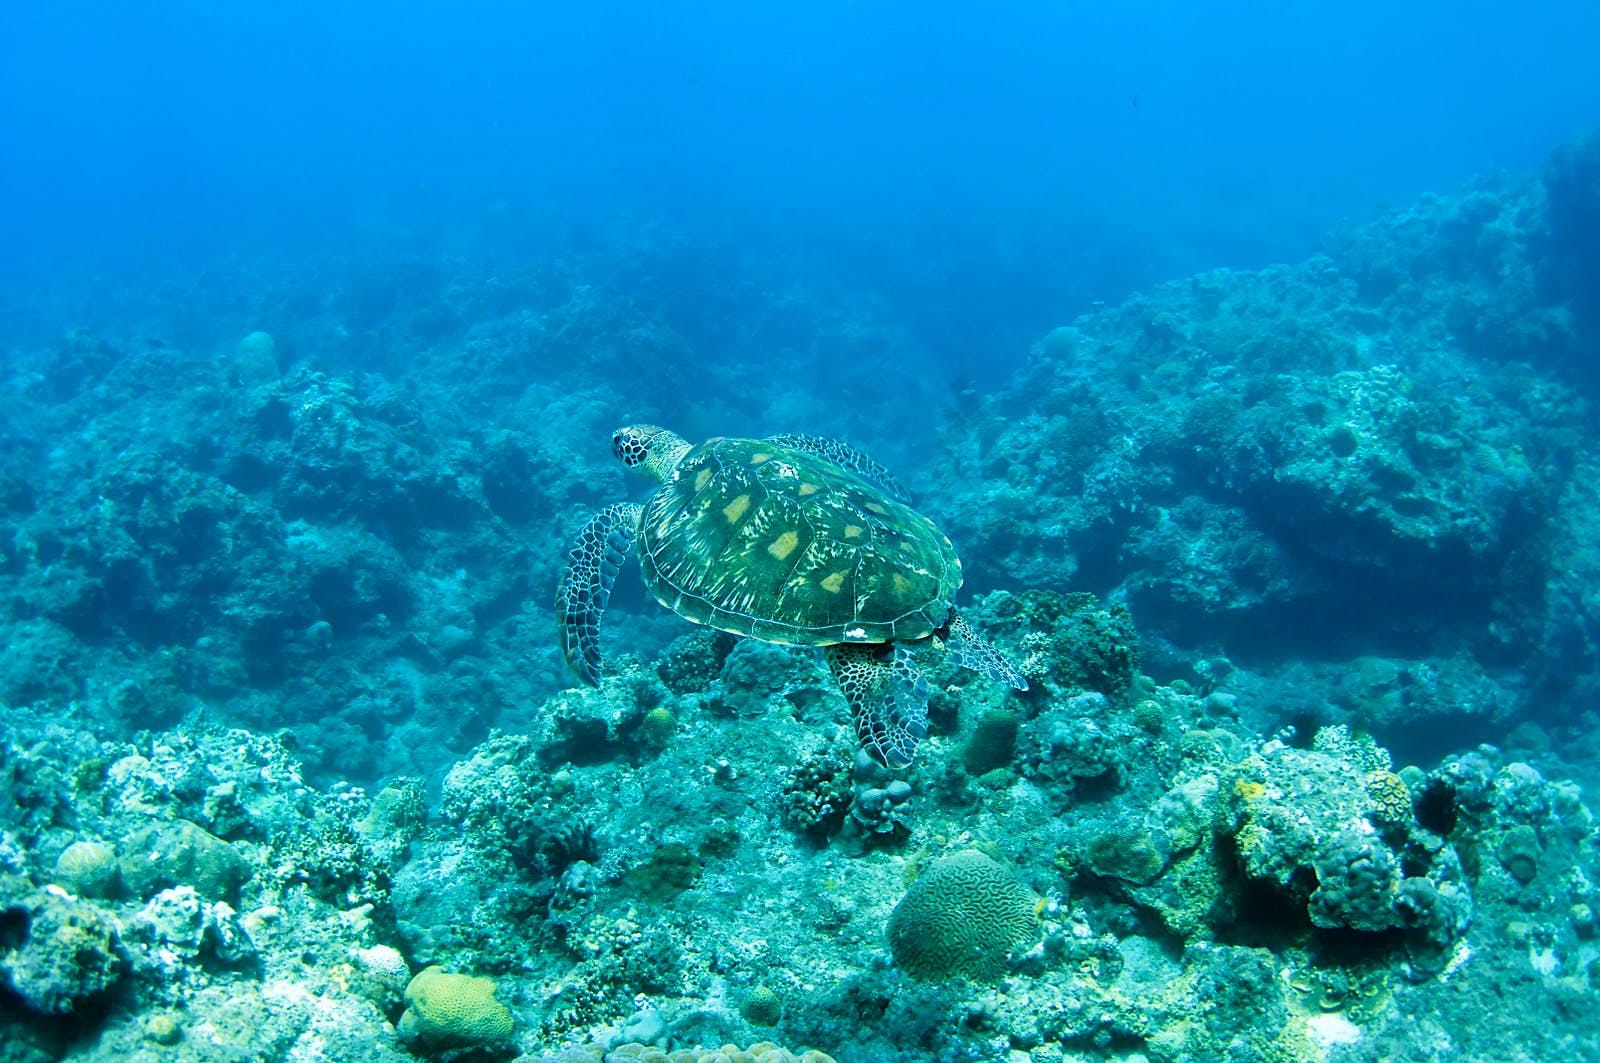 Snorkellers can often spot gentle sea turtles swimming in the shallows off Little Liuchiu © Jung Hsuan / Shutterstock